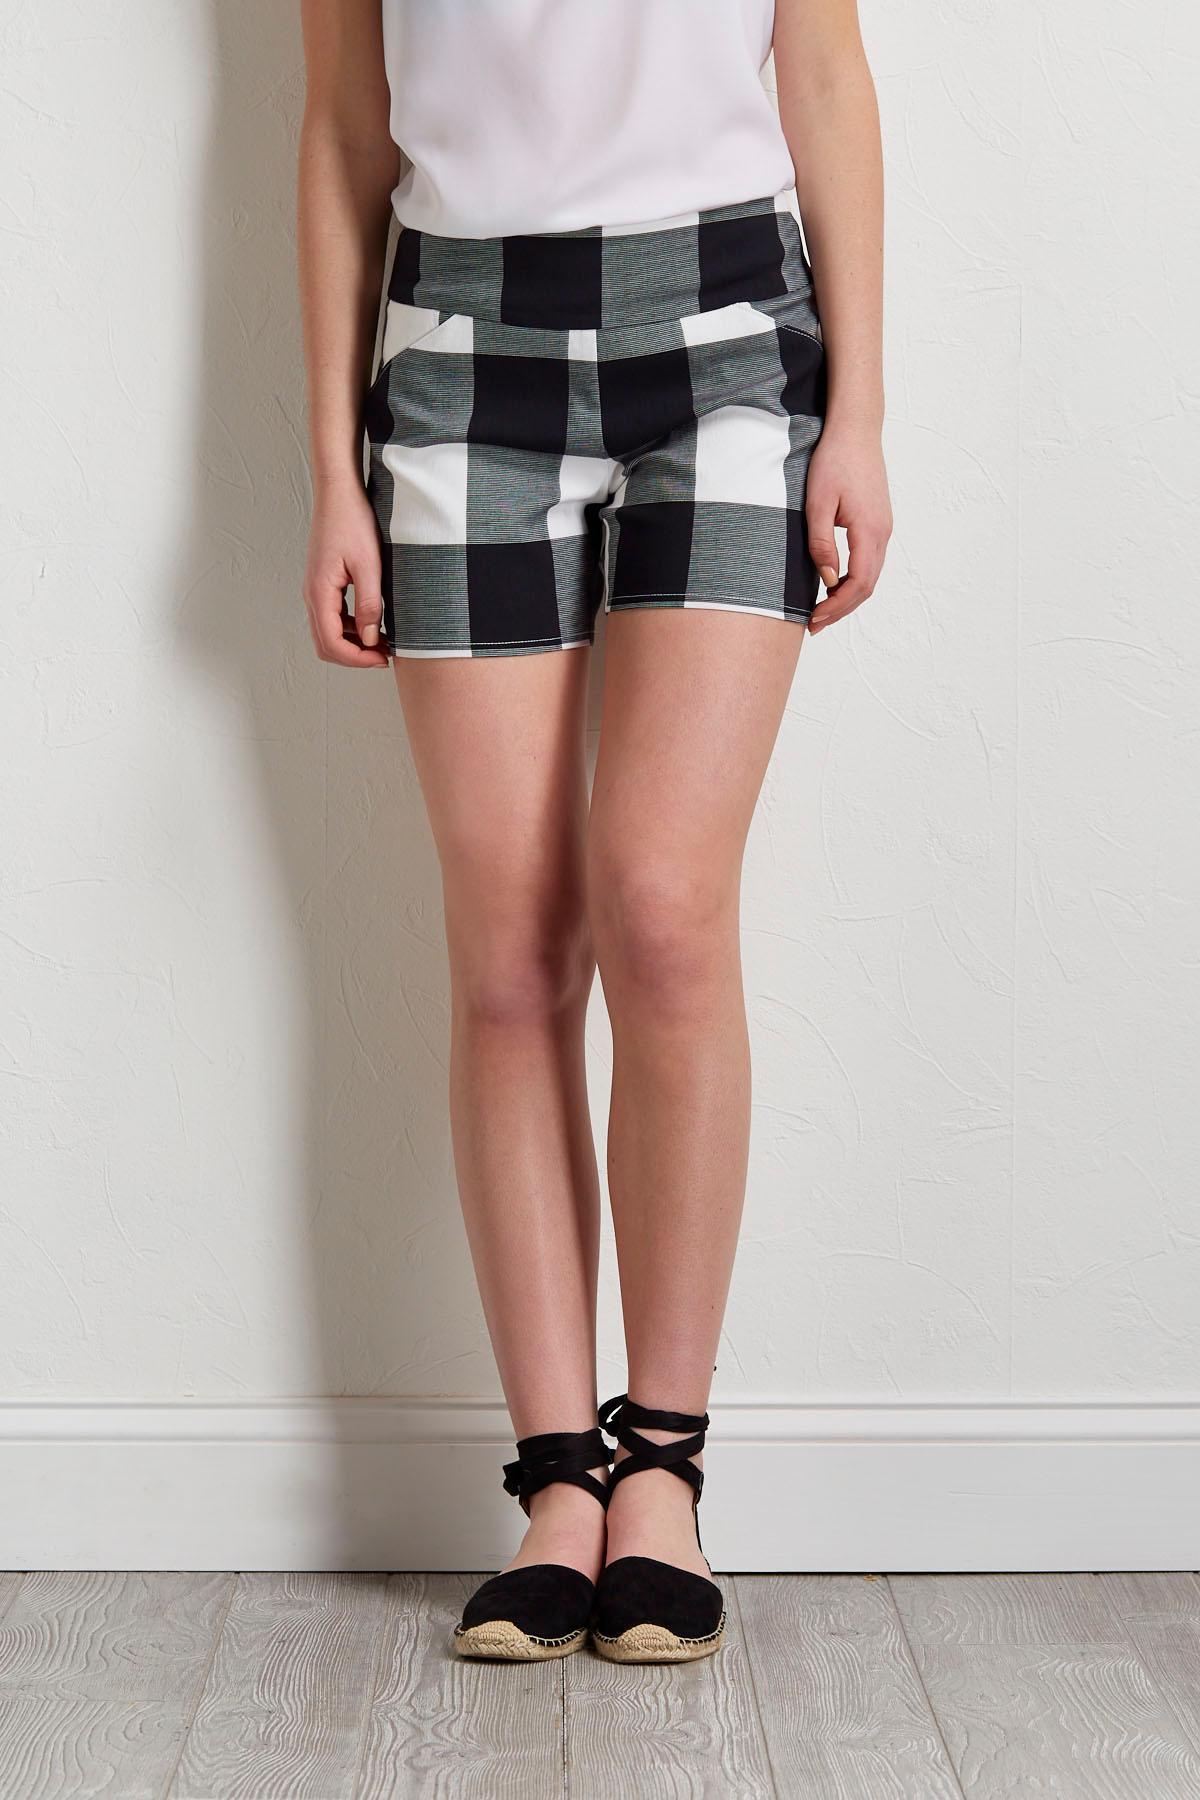 Black And White Checkered Shorts